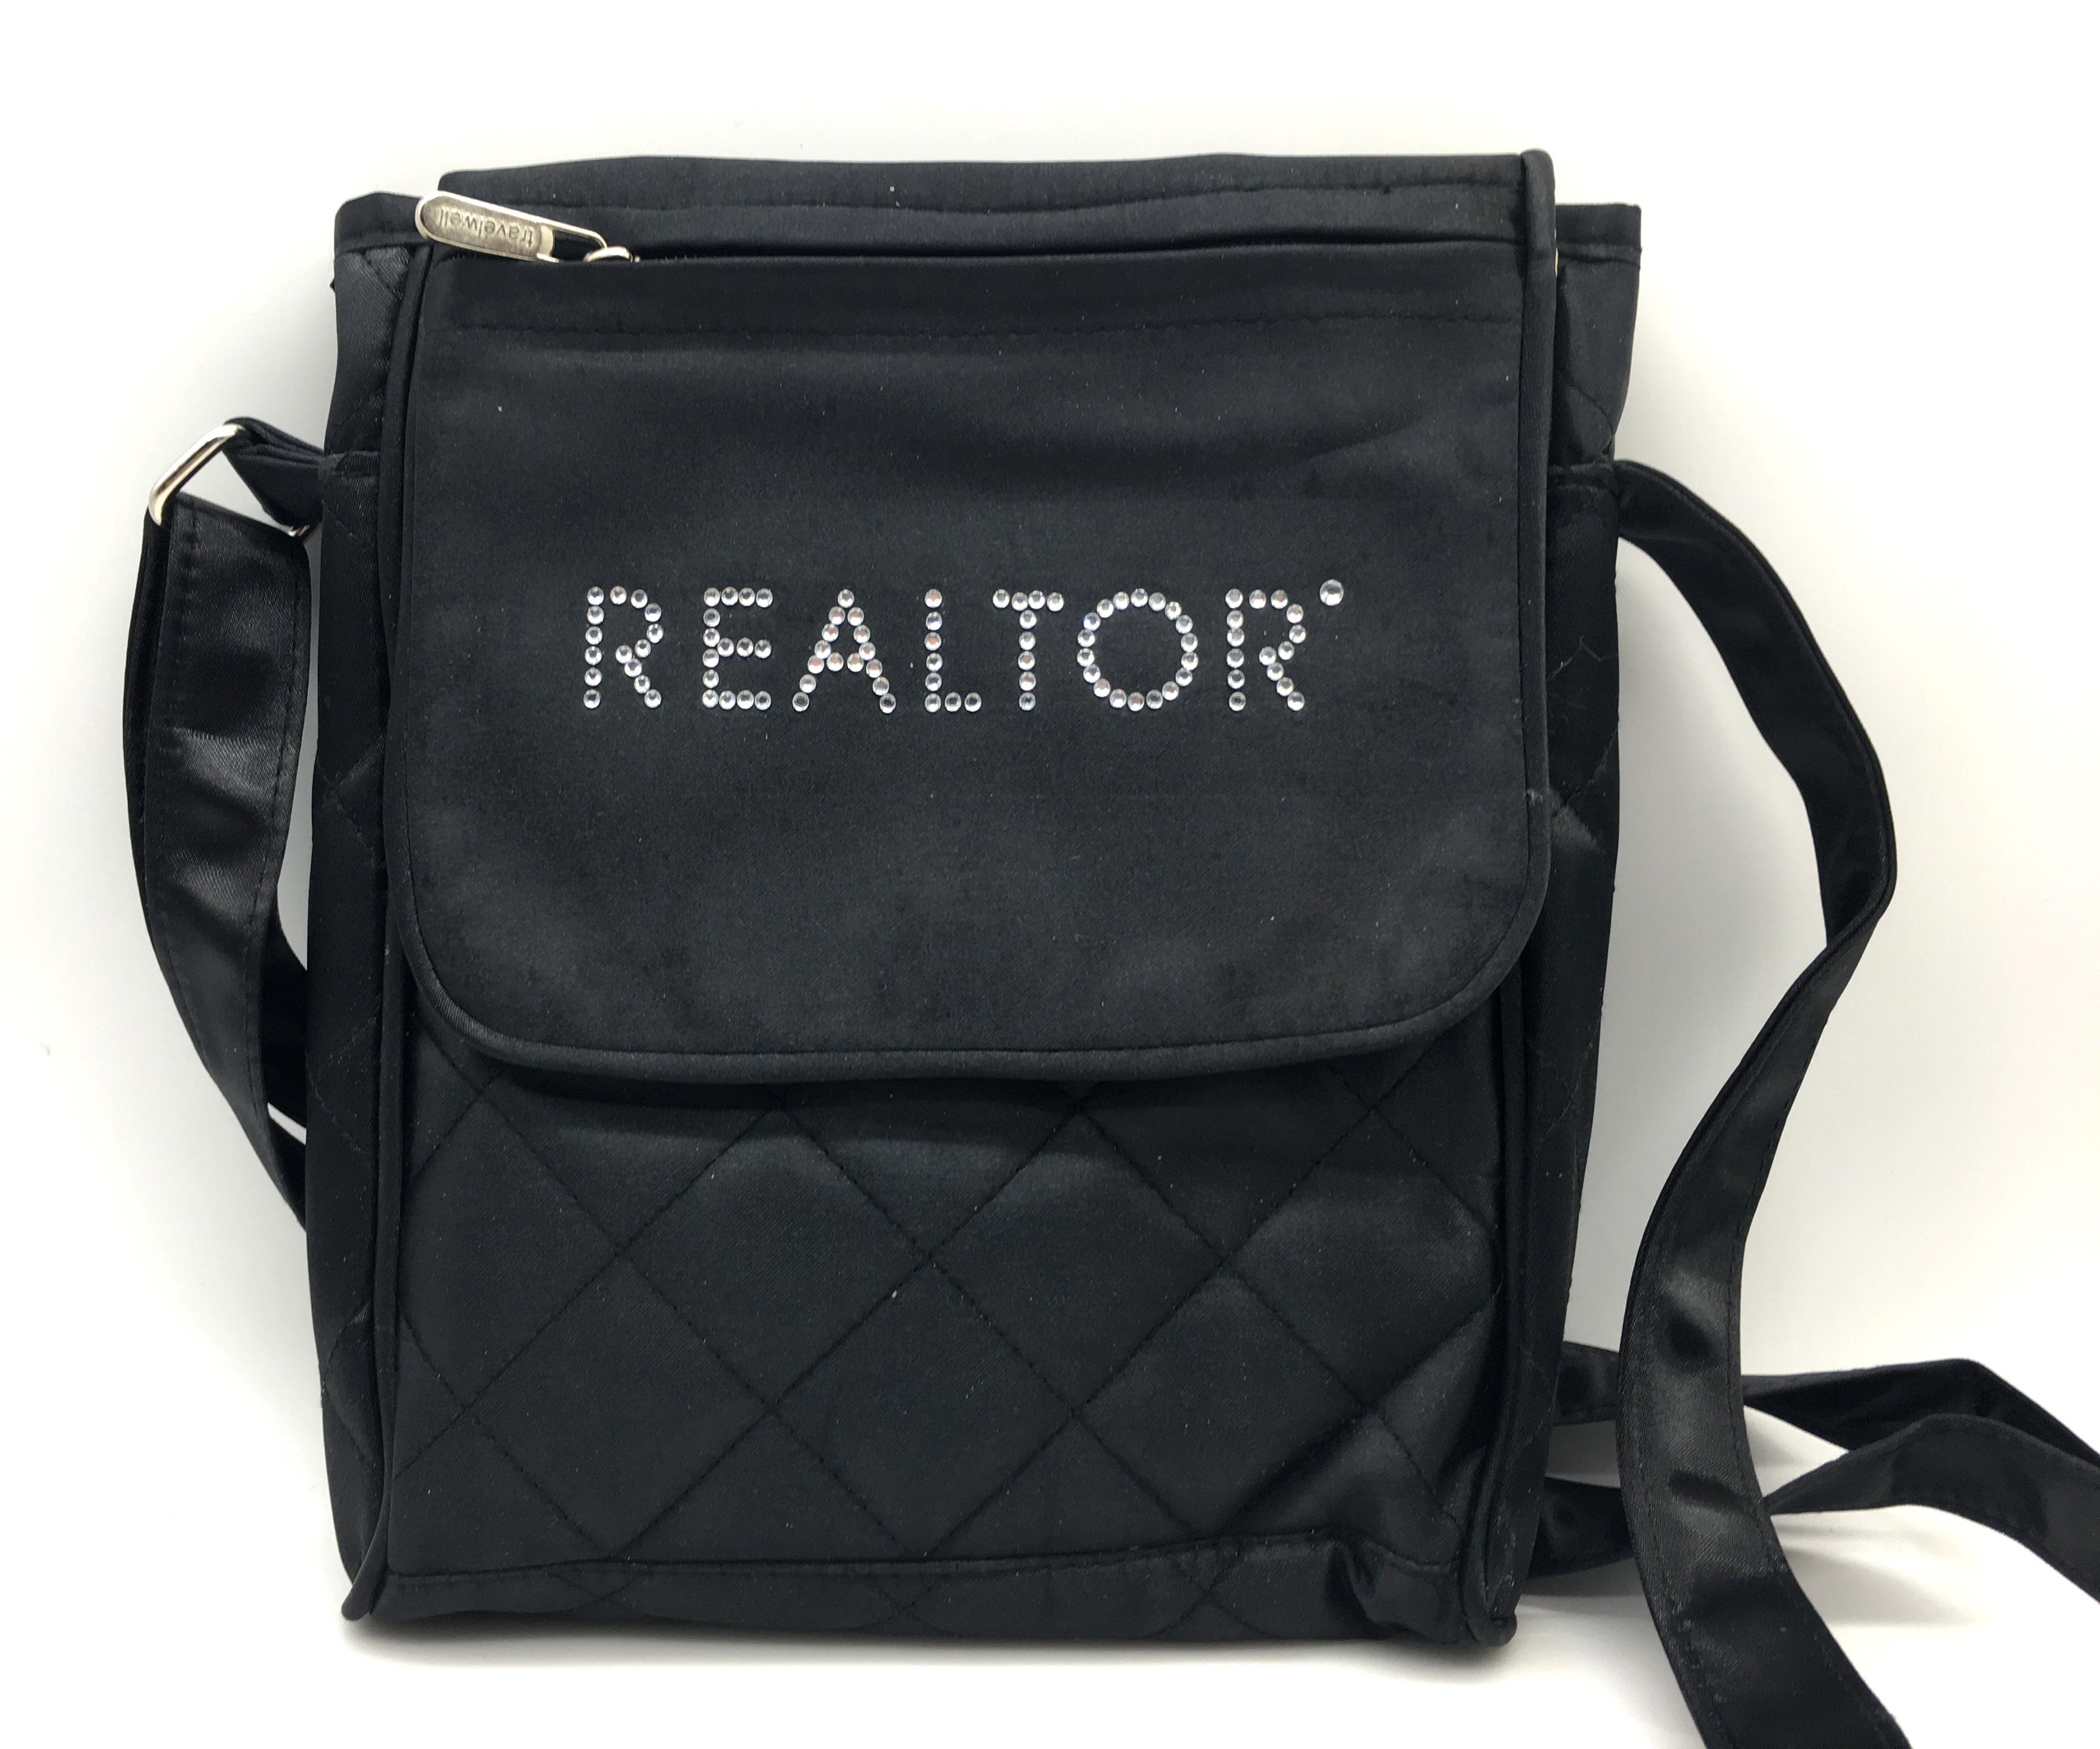 Rhinestone Crossbody Quilted Bag